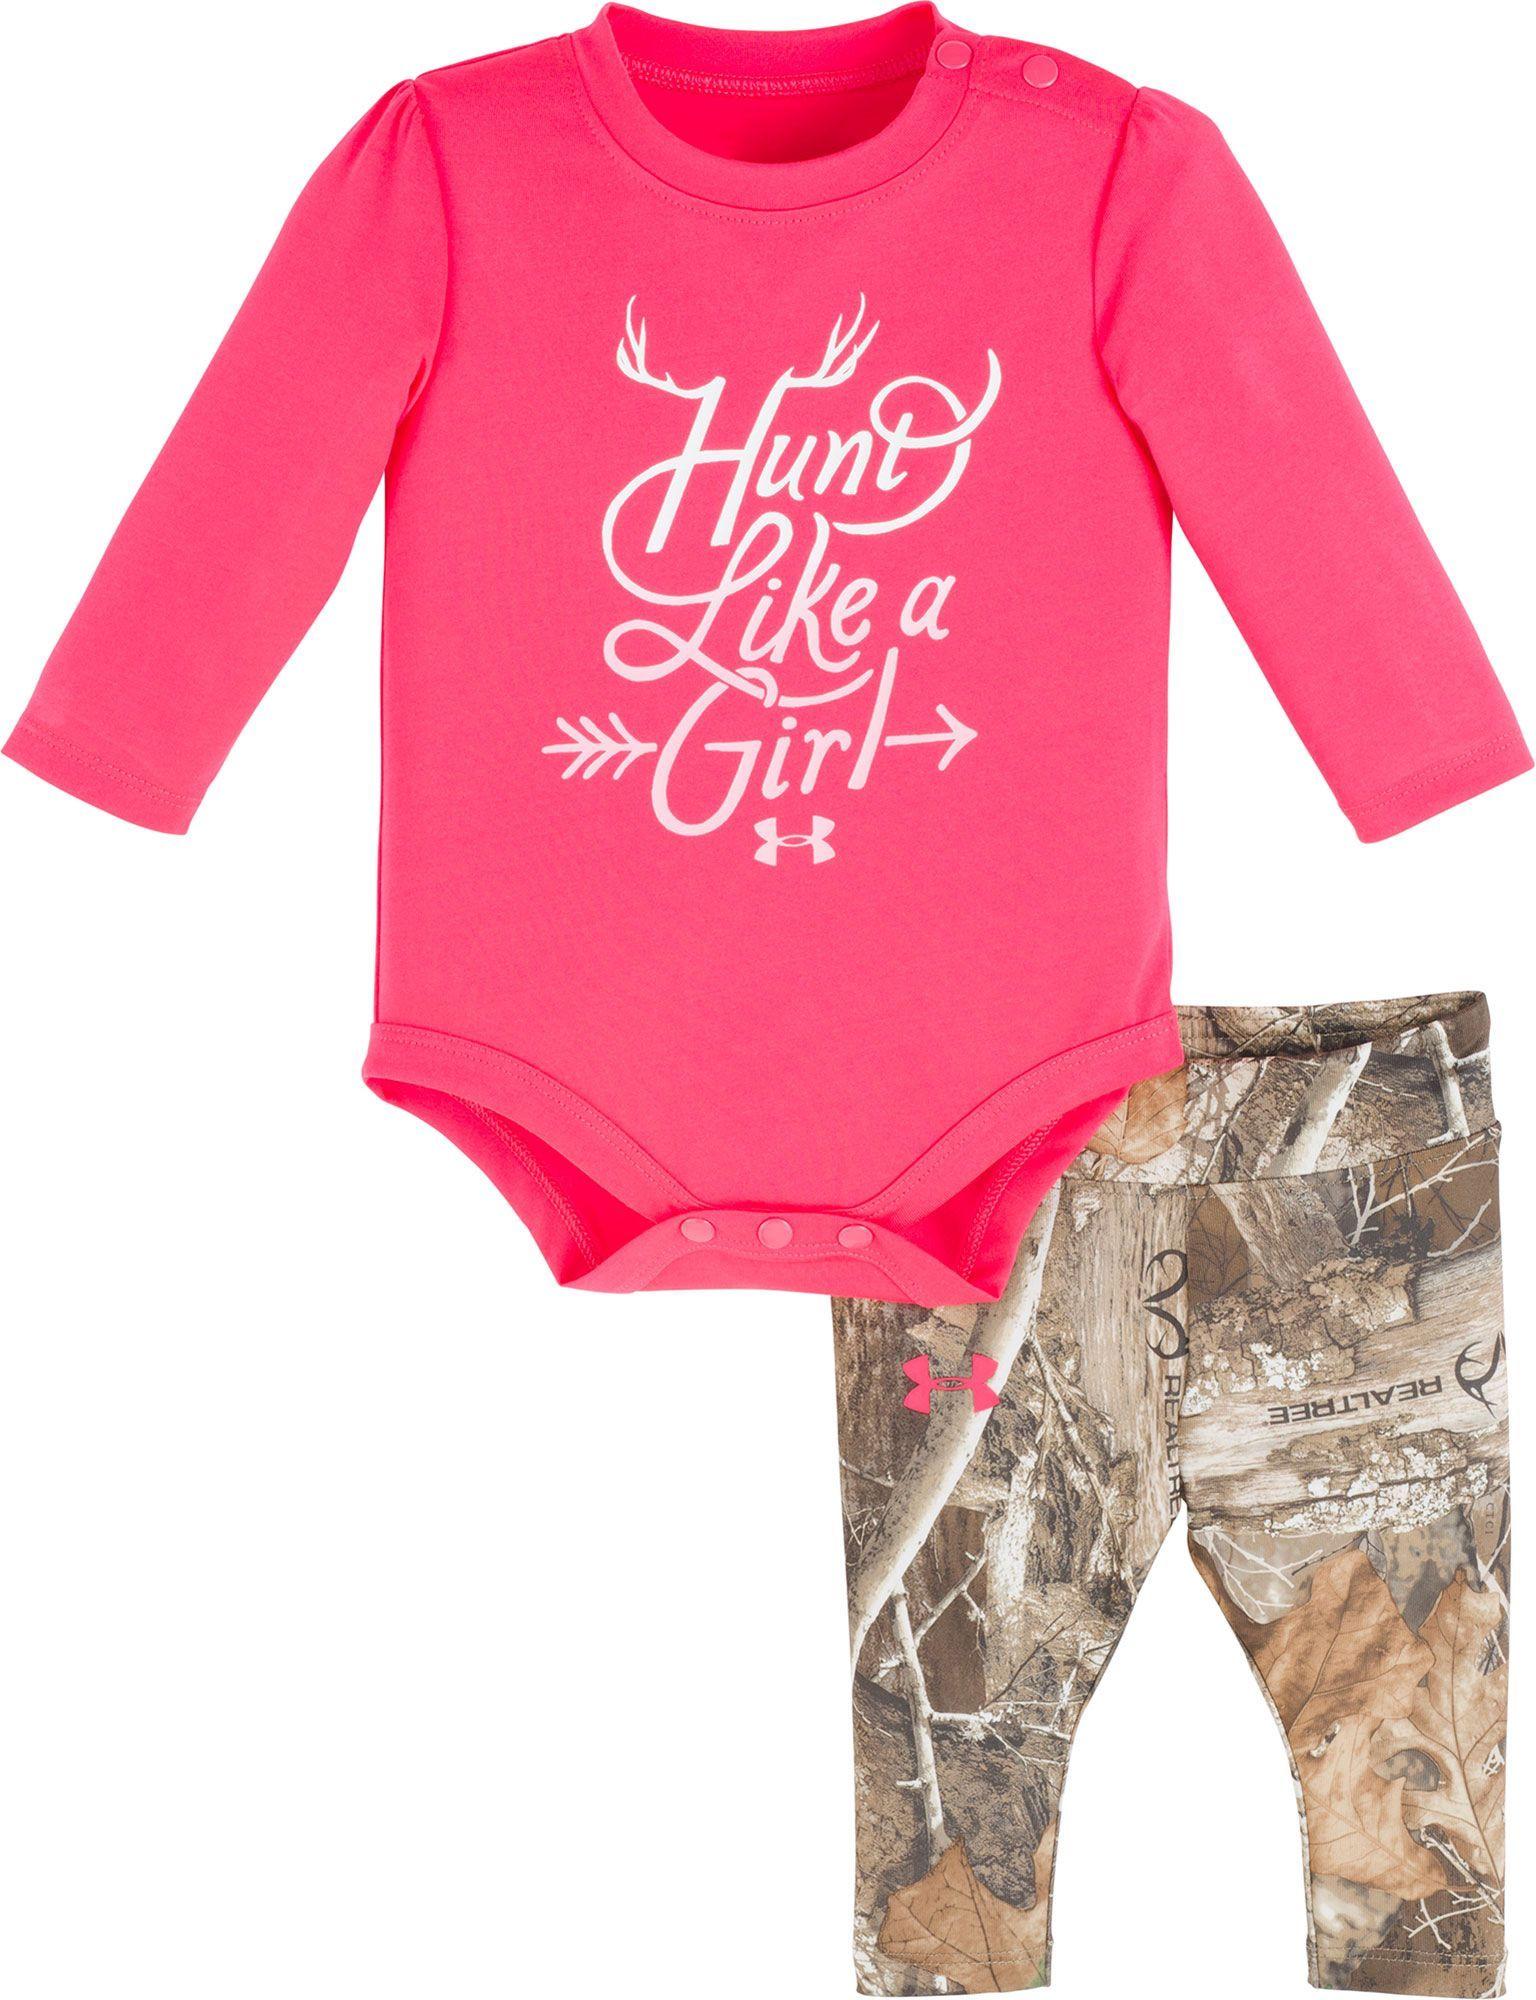 Under Armour Newborn Girls Hunt Like A Girl Long Sleeve